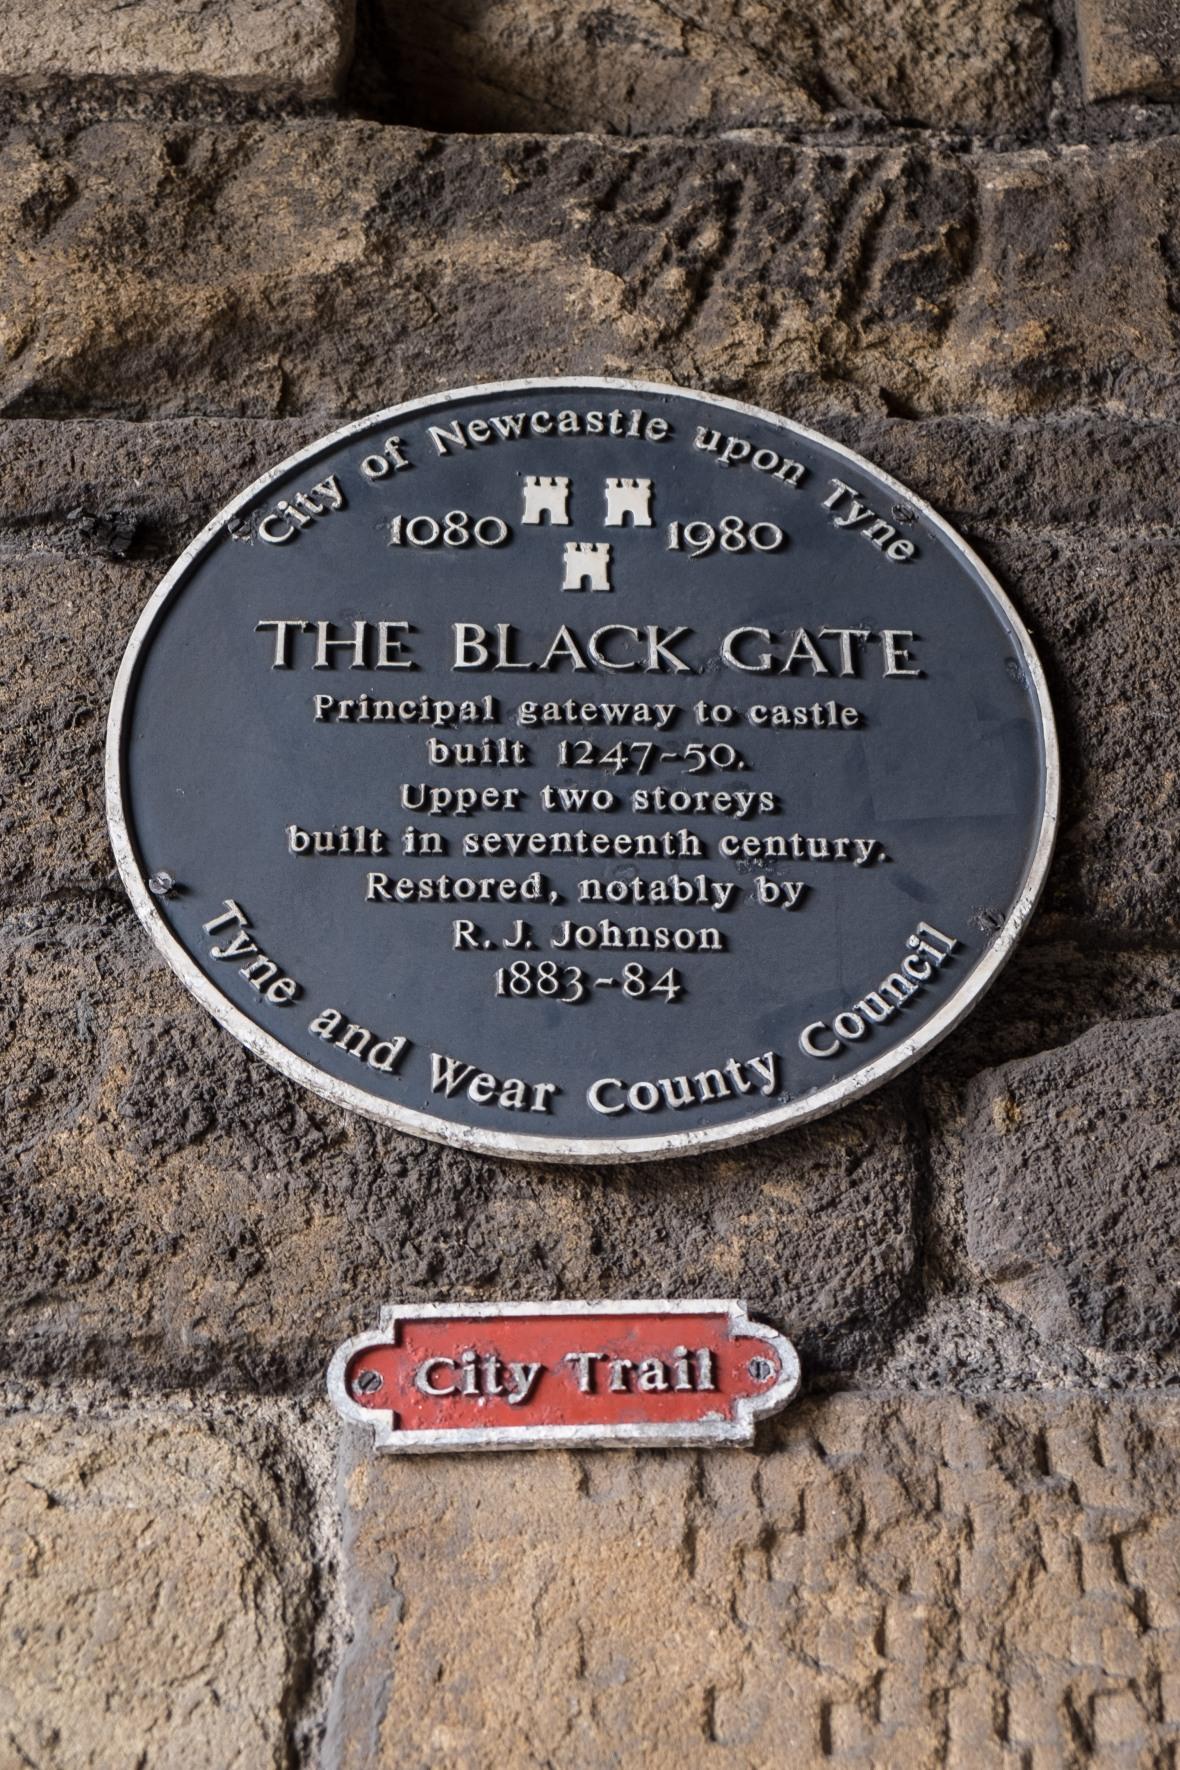 The Black Gate plaque